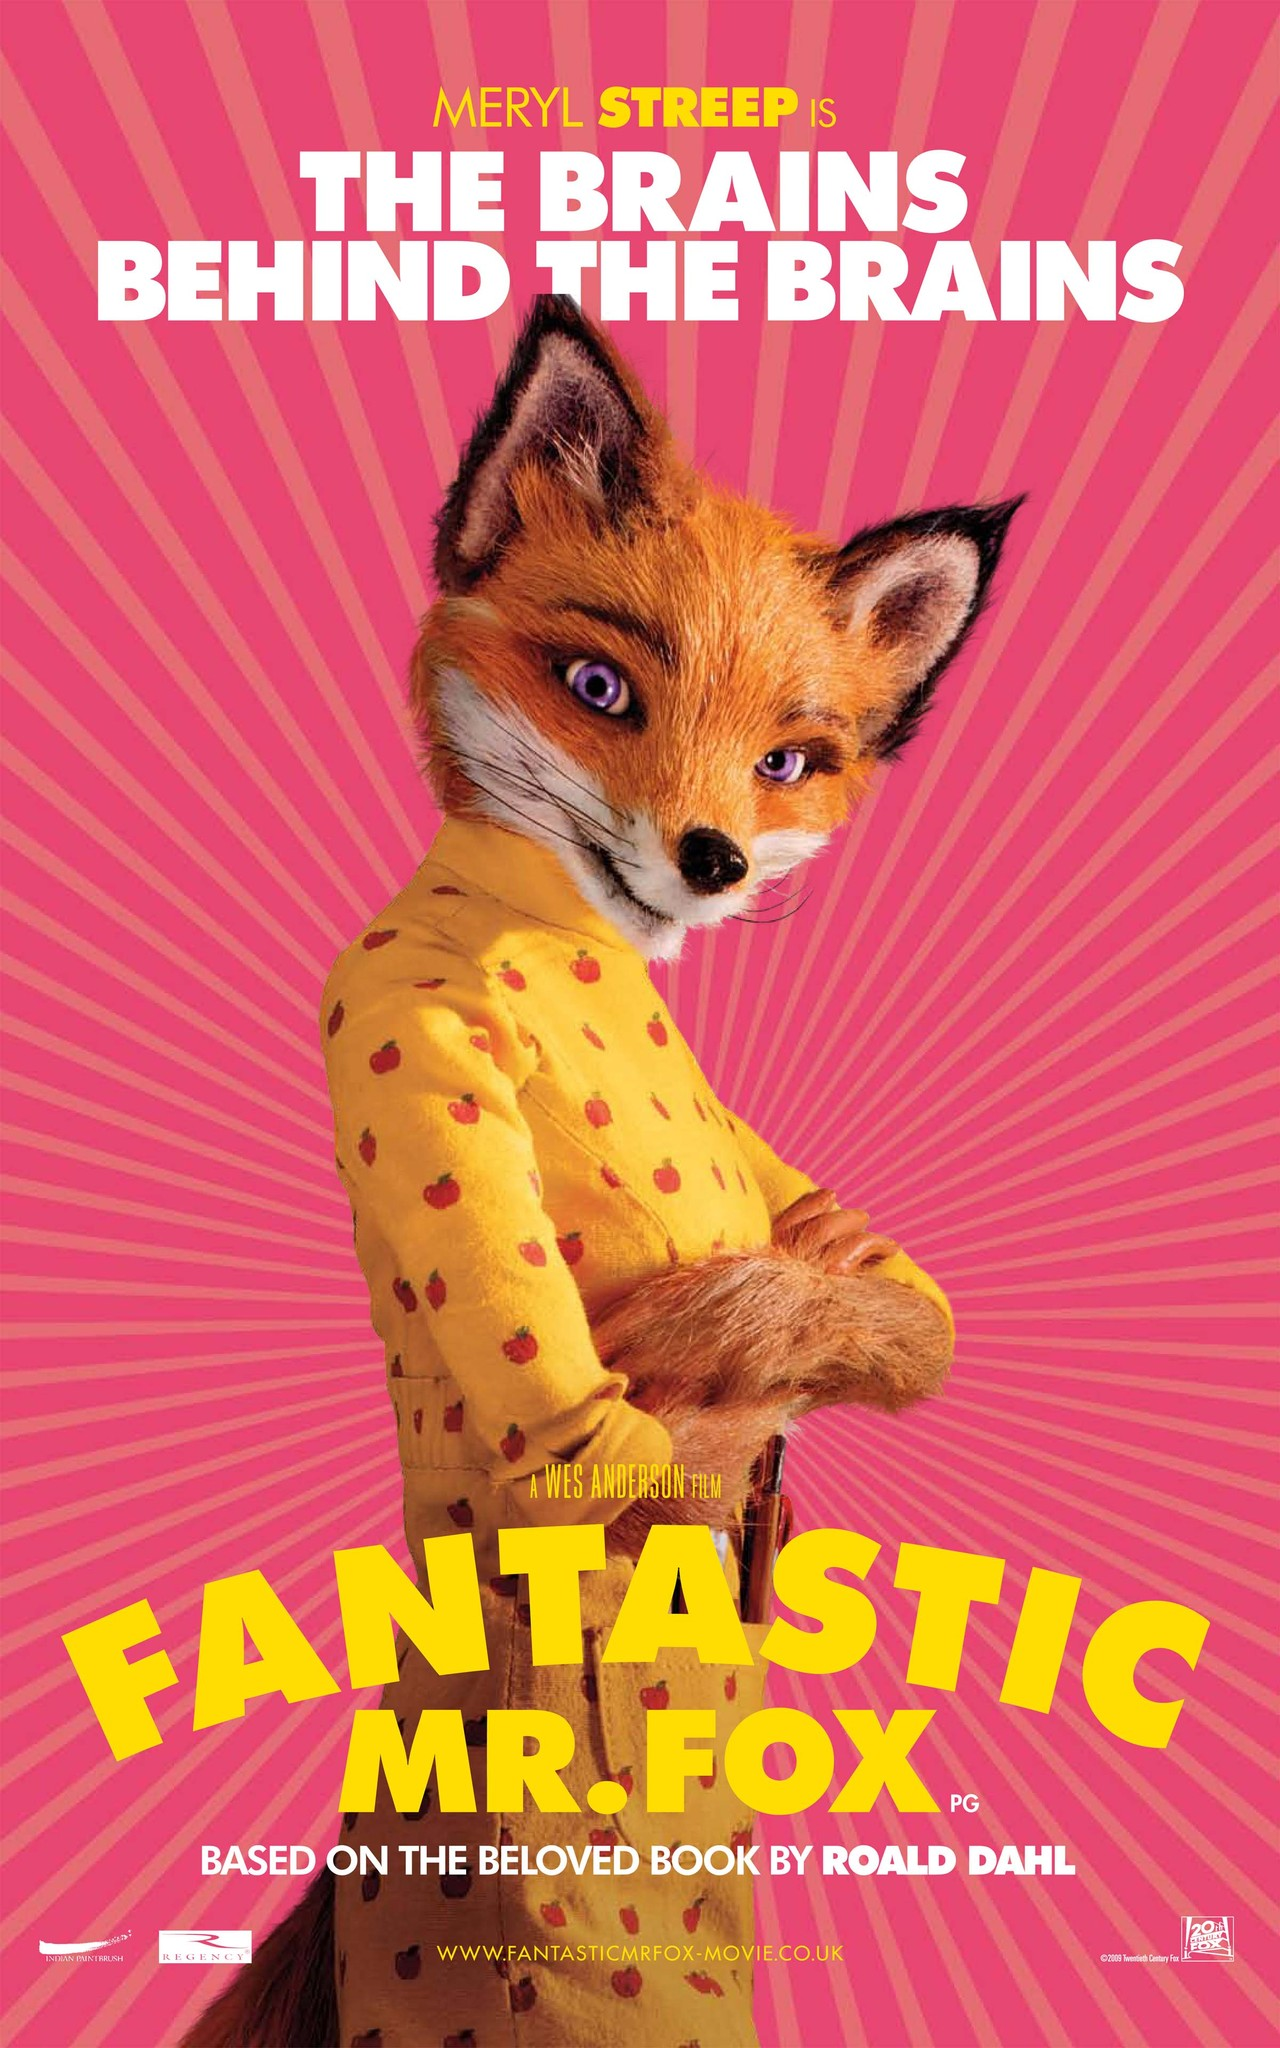 fantastic mr fox full movie download free